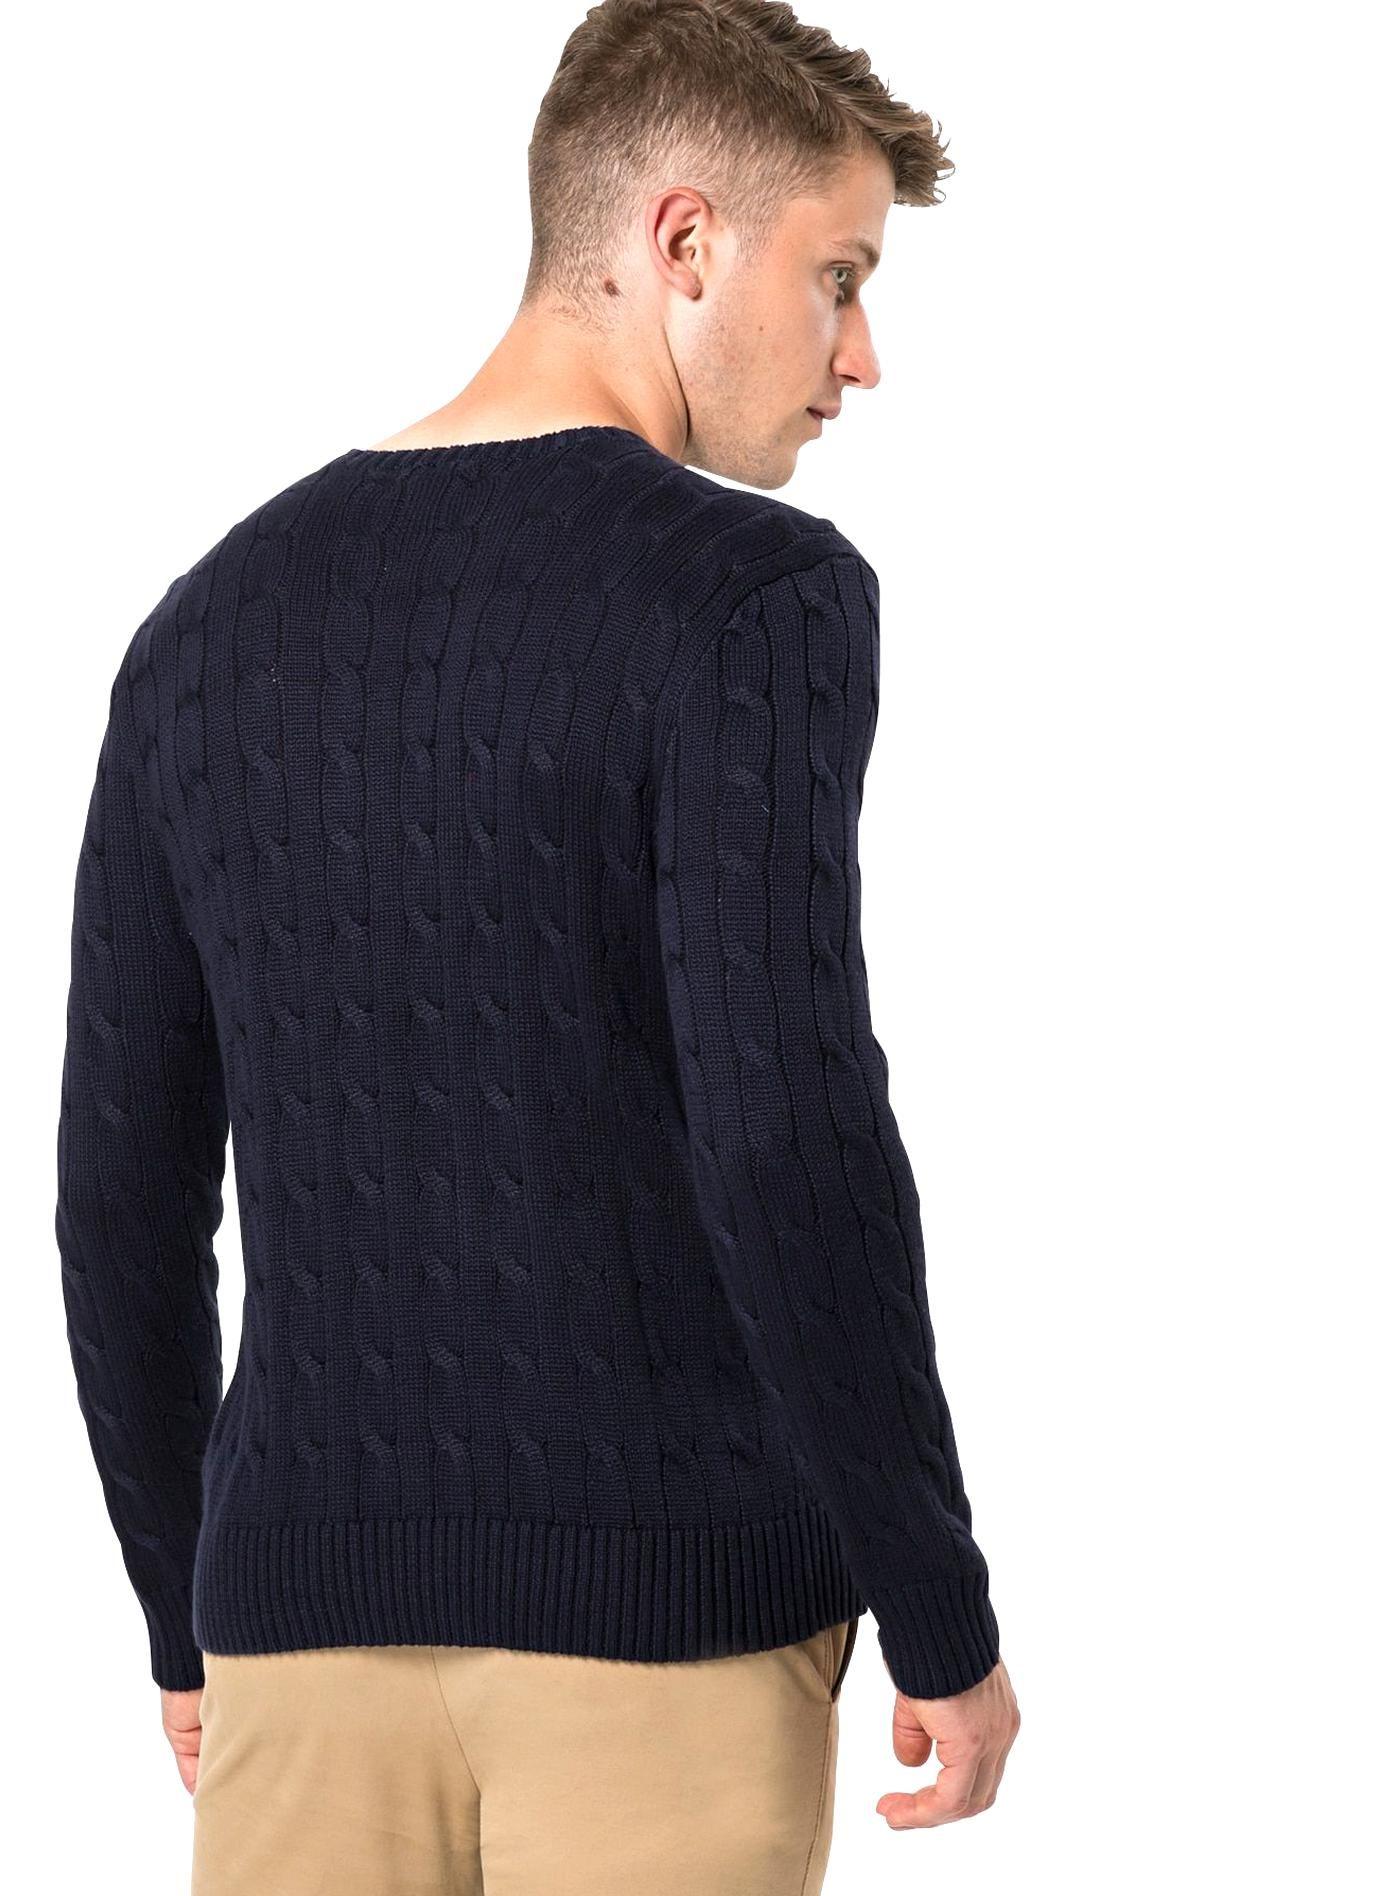 Polo Ralph Lauren Pullover Ls Cbl Cn Pp Long Sleeve Sweater Herren Dunkelblau Gre S Ralph Lauren Pullover Long Sleeve Sweater Pullover